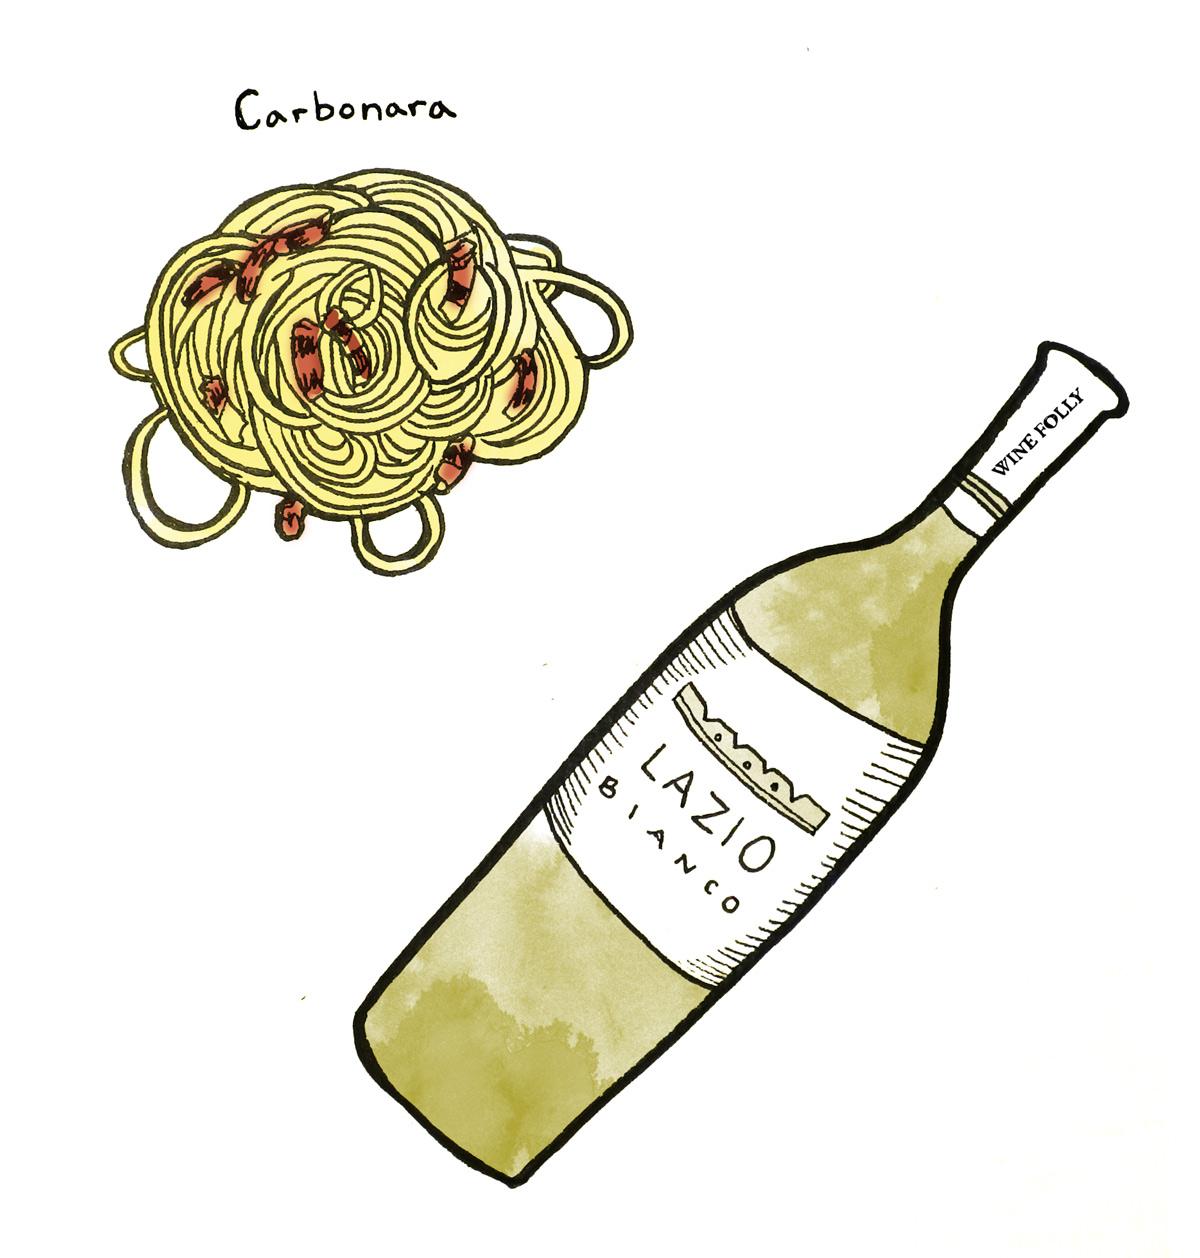 carbonara-lazio-bianco-frascati